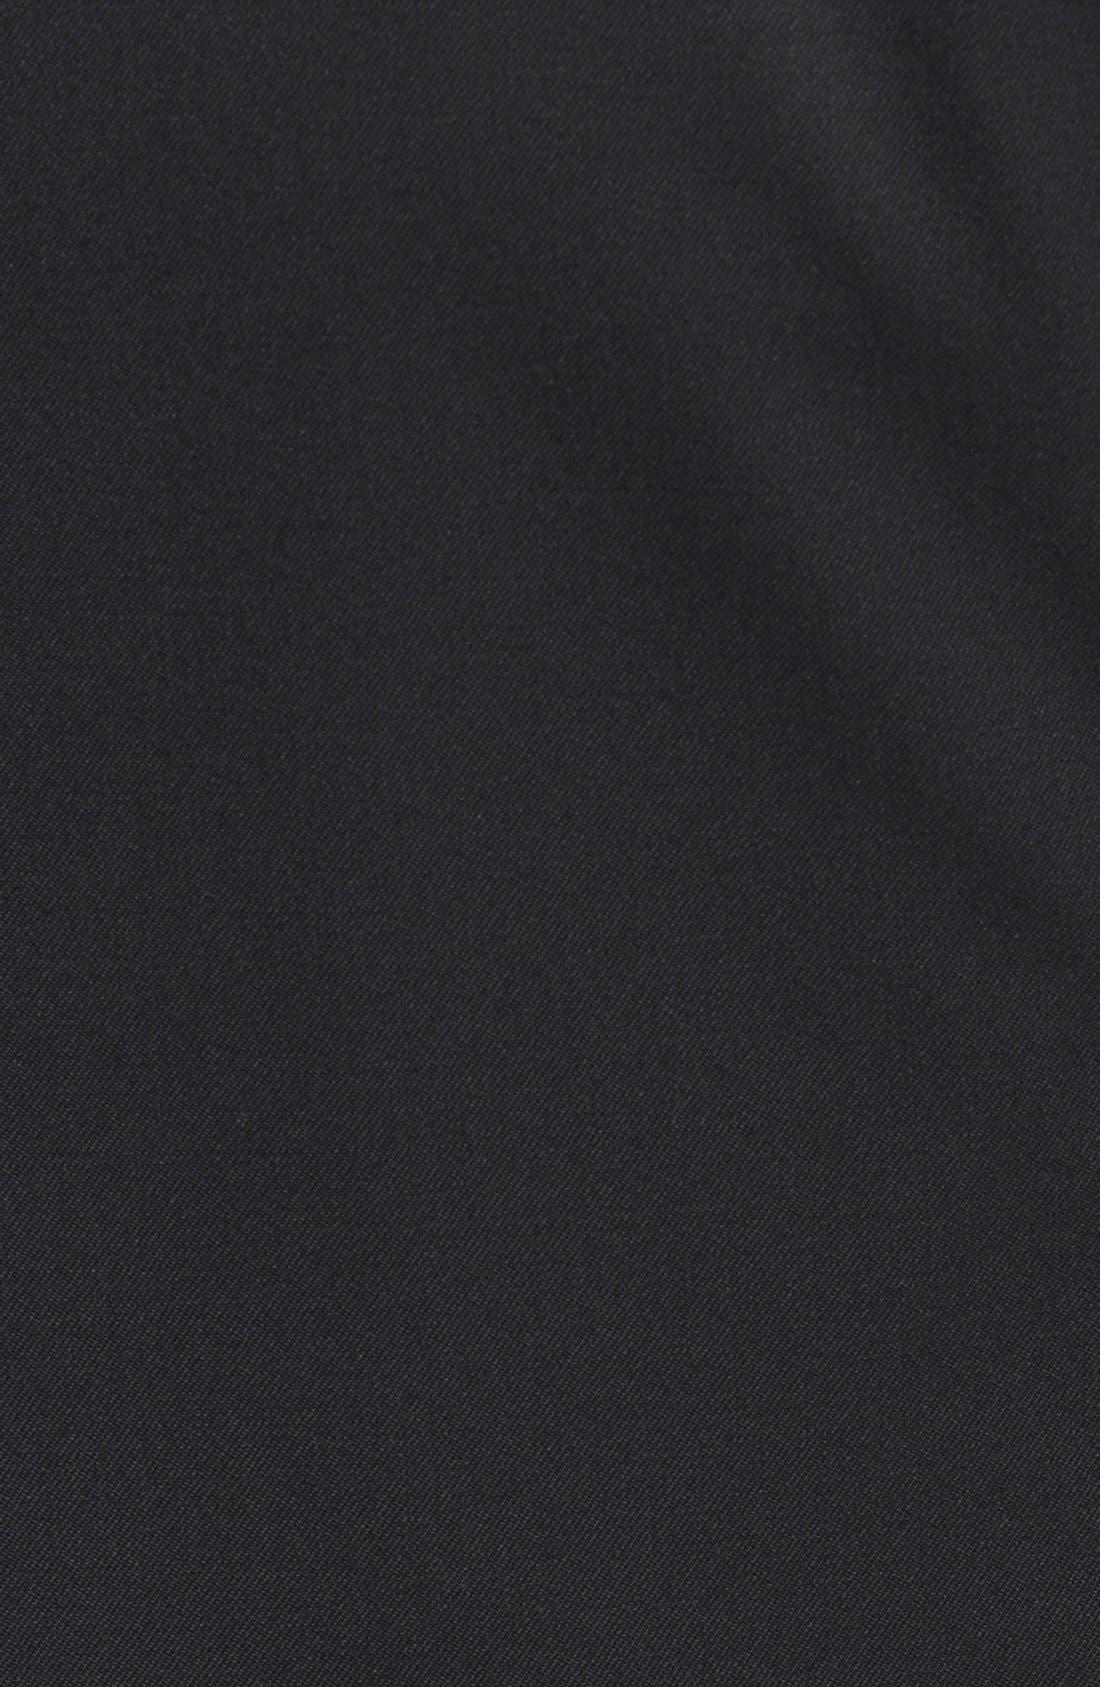 RAG & BONE,                             'Archer' One-Button Wool Blend Blazer,                             Alternate thumbnail 3, color,                             001